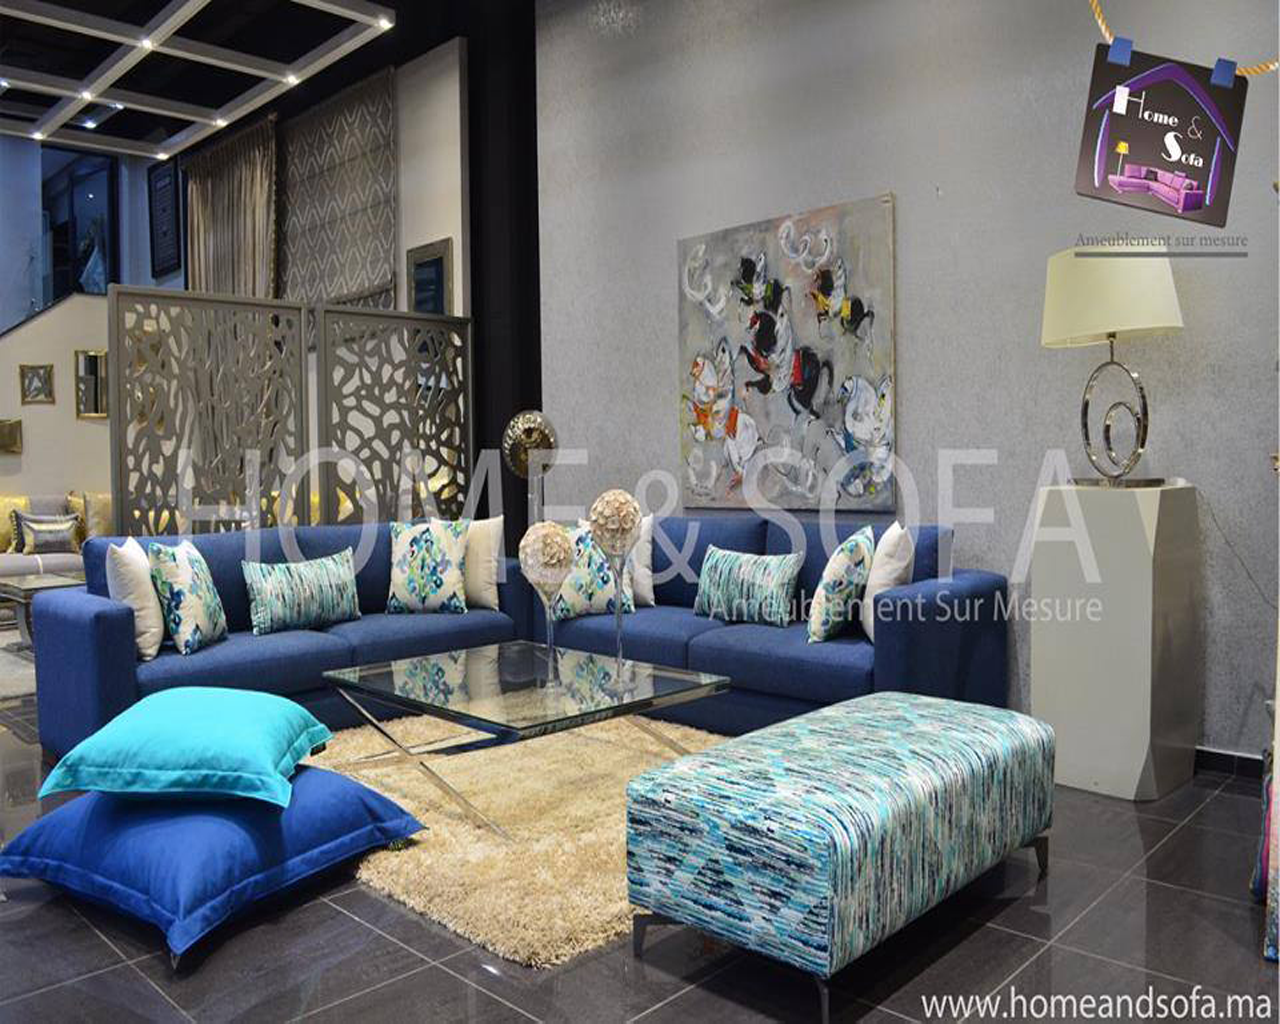 Salon moderne Home and Sofa | SALON MAROCAIN | Pinterest | Salons